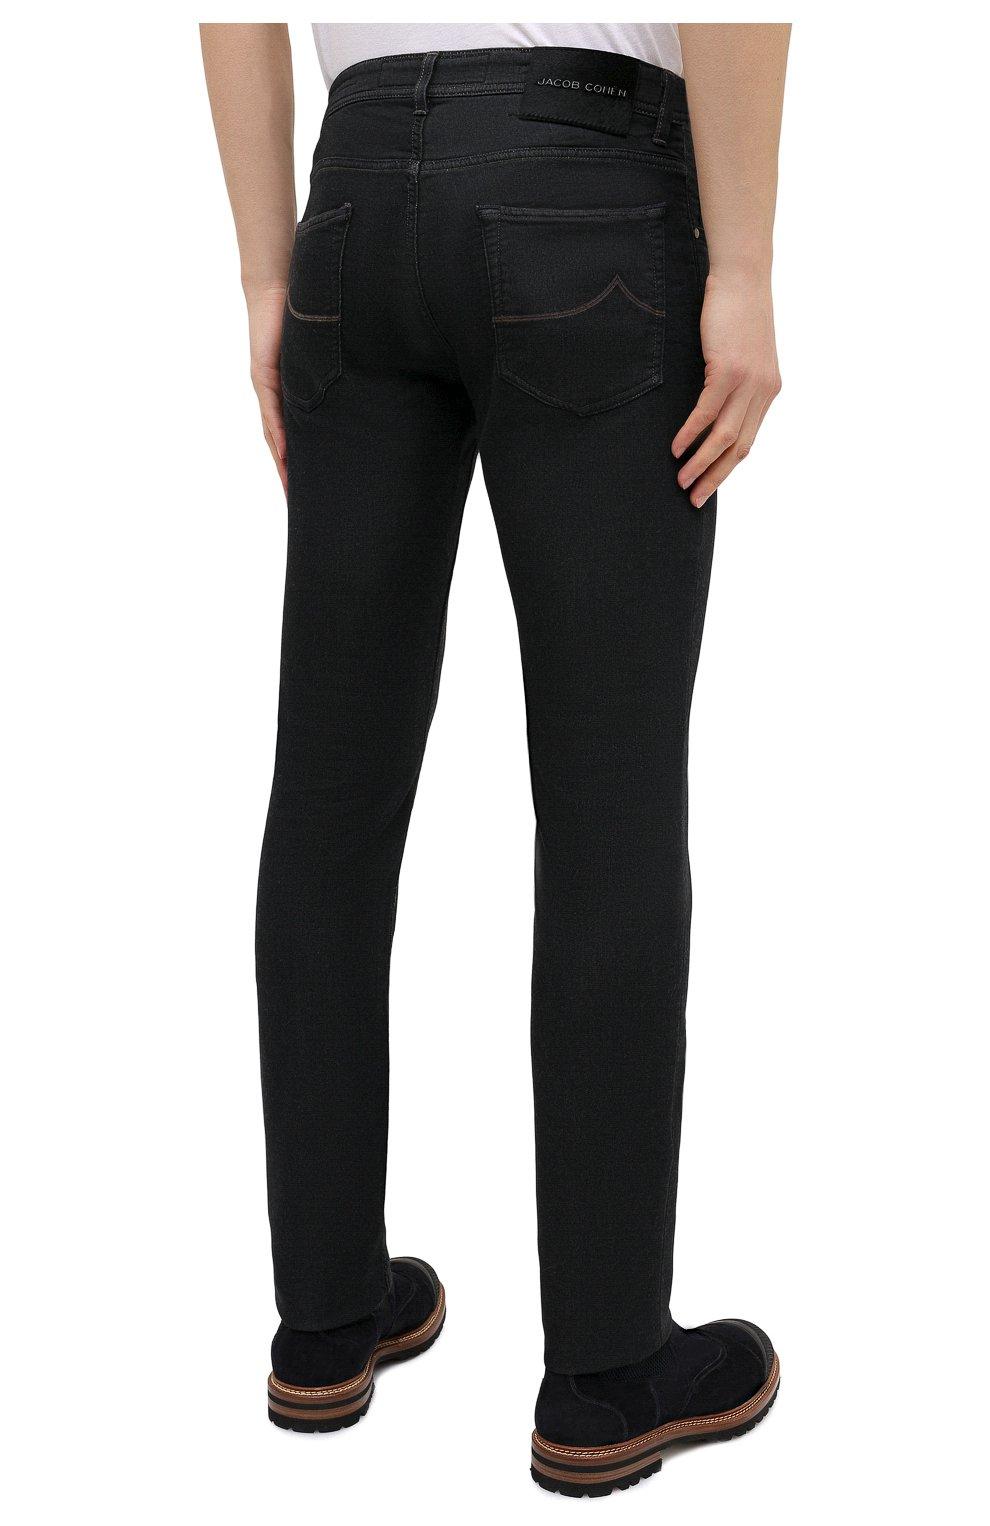 Мужские джинсы JACOB COHEN черного цвета, арт. J622 C0MF 02042-W1/54 | Фото 4